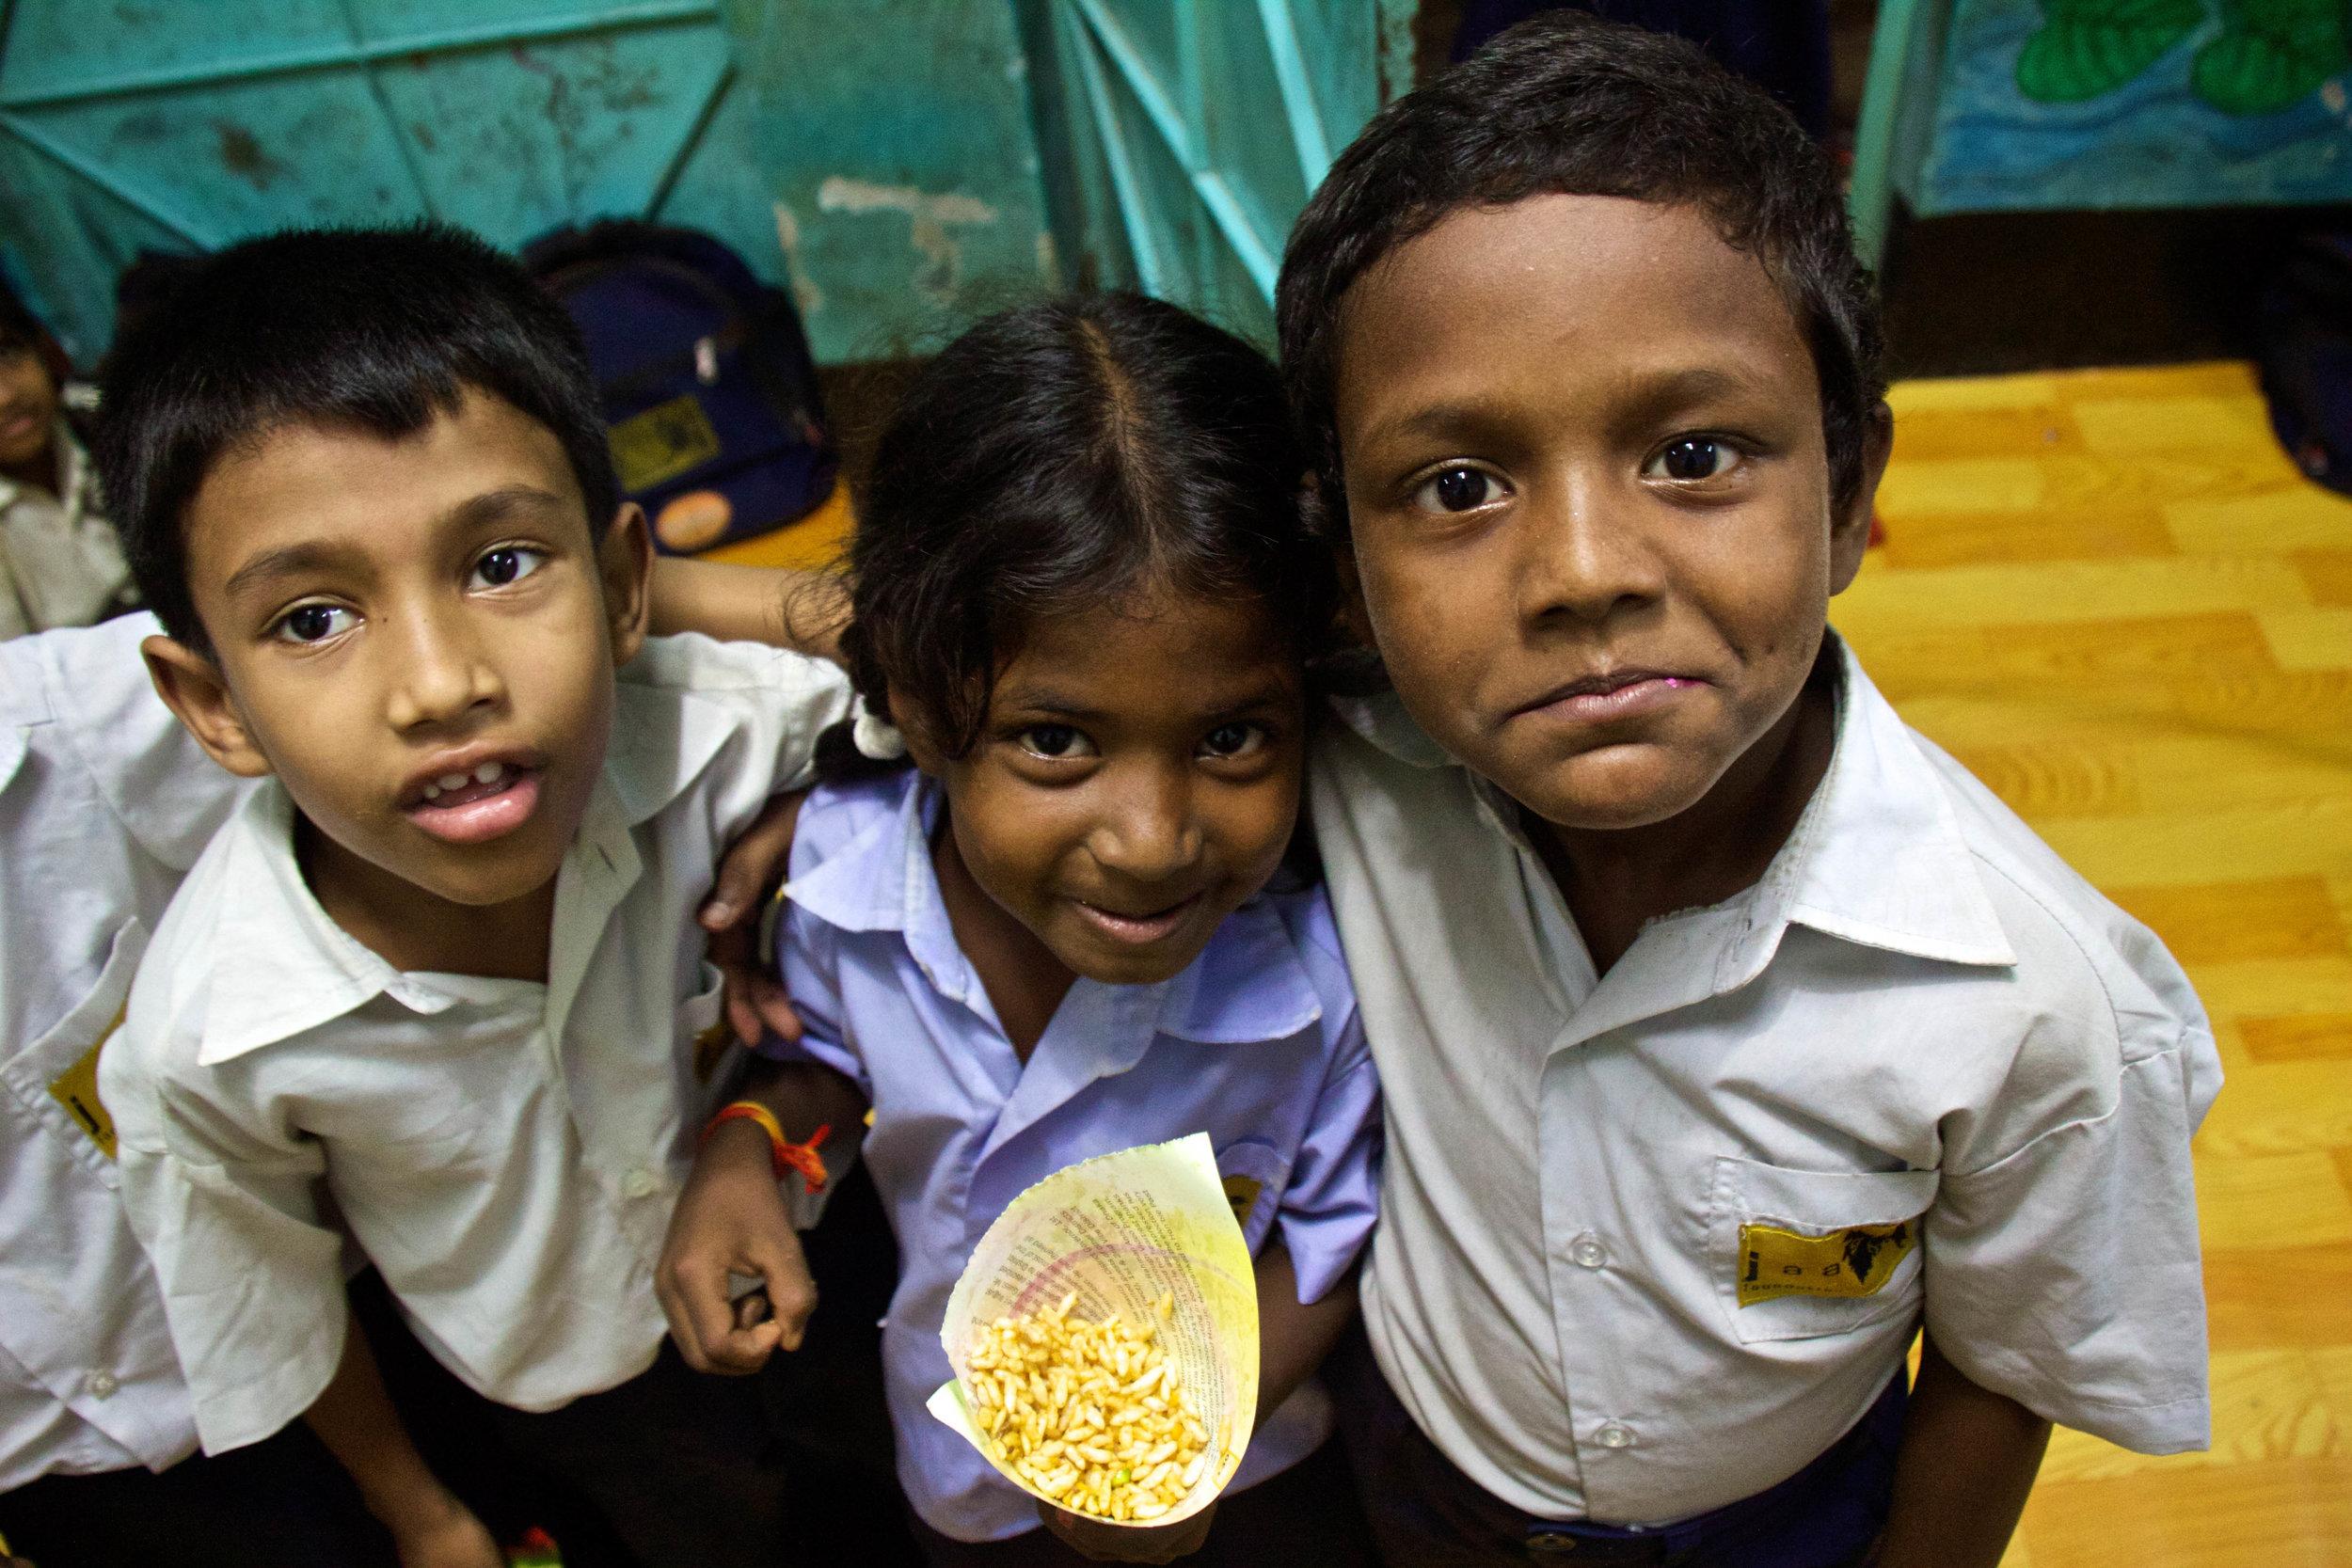 dhaka bangladesh jaago school children-53-33.jpg